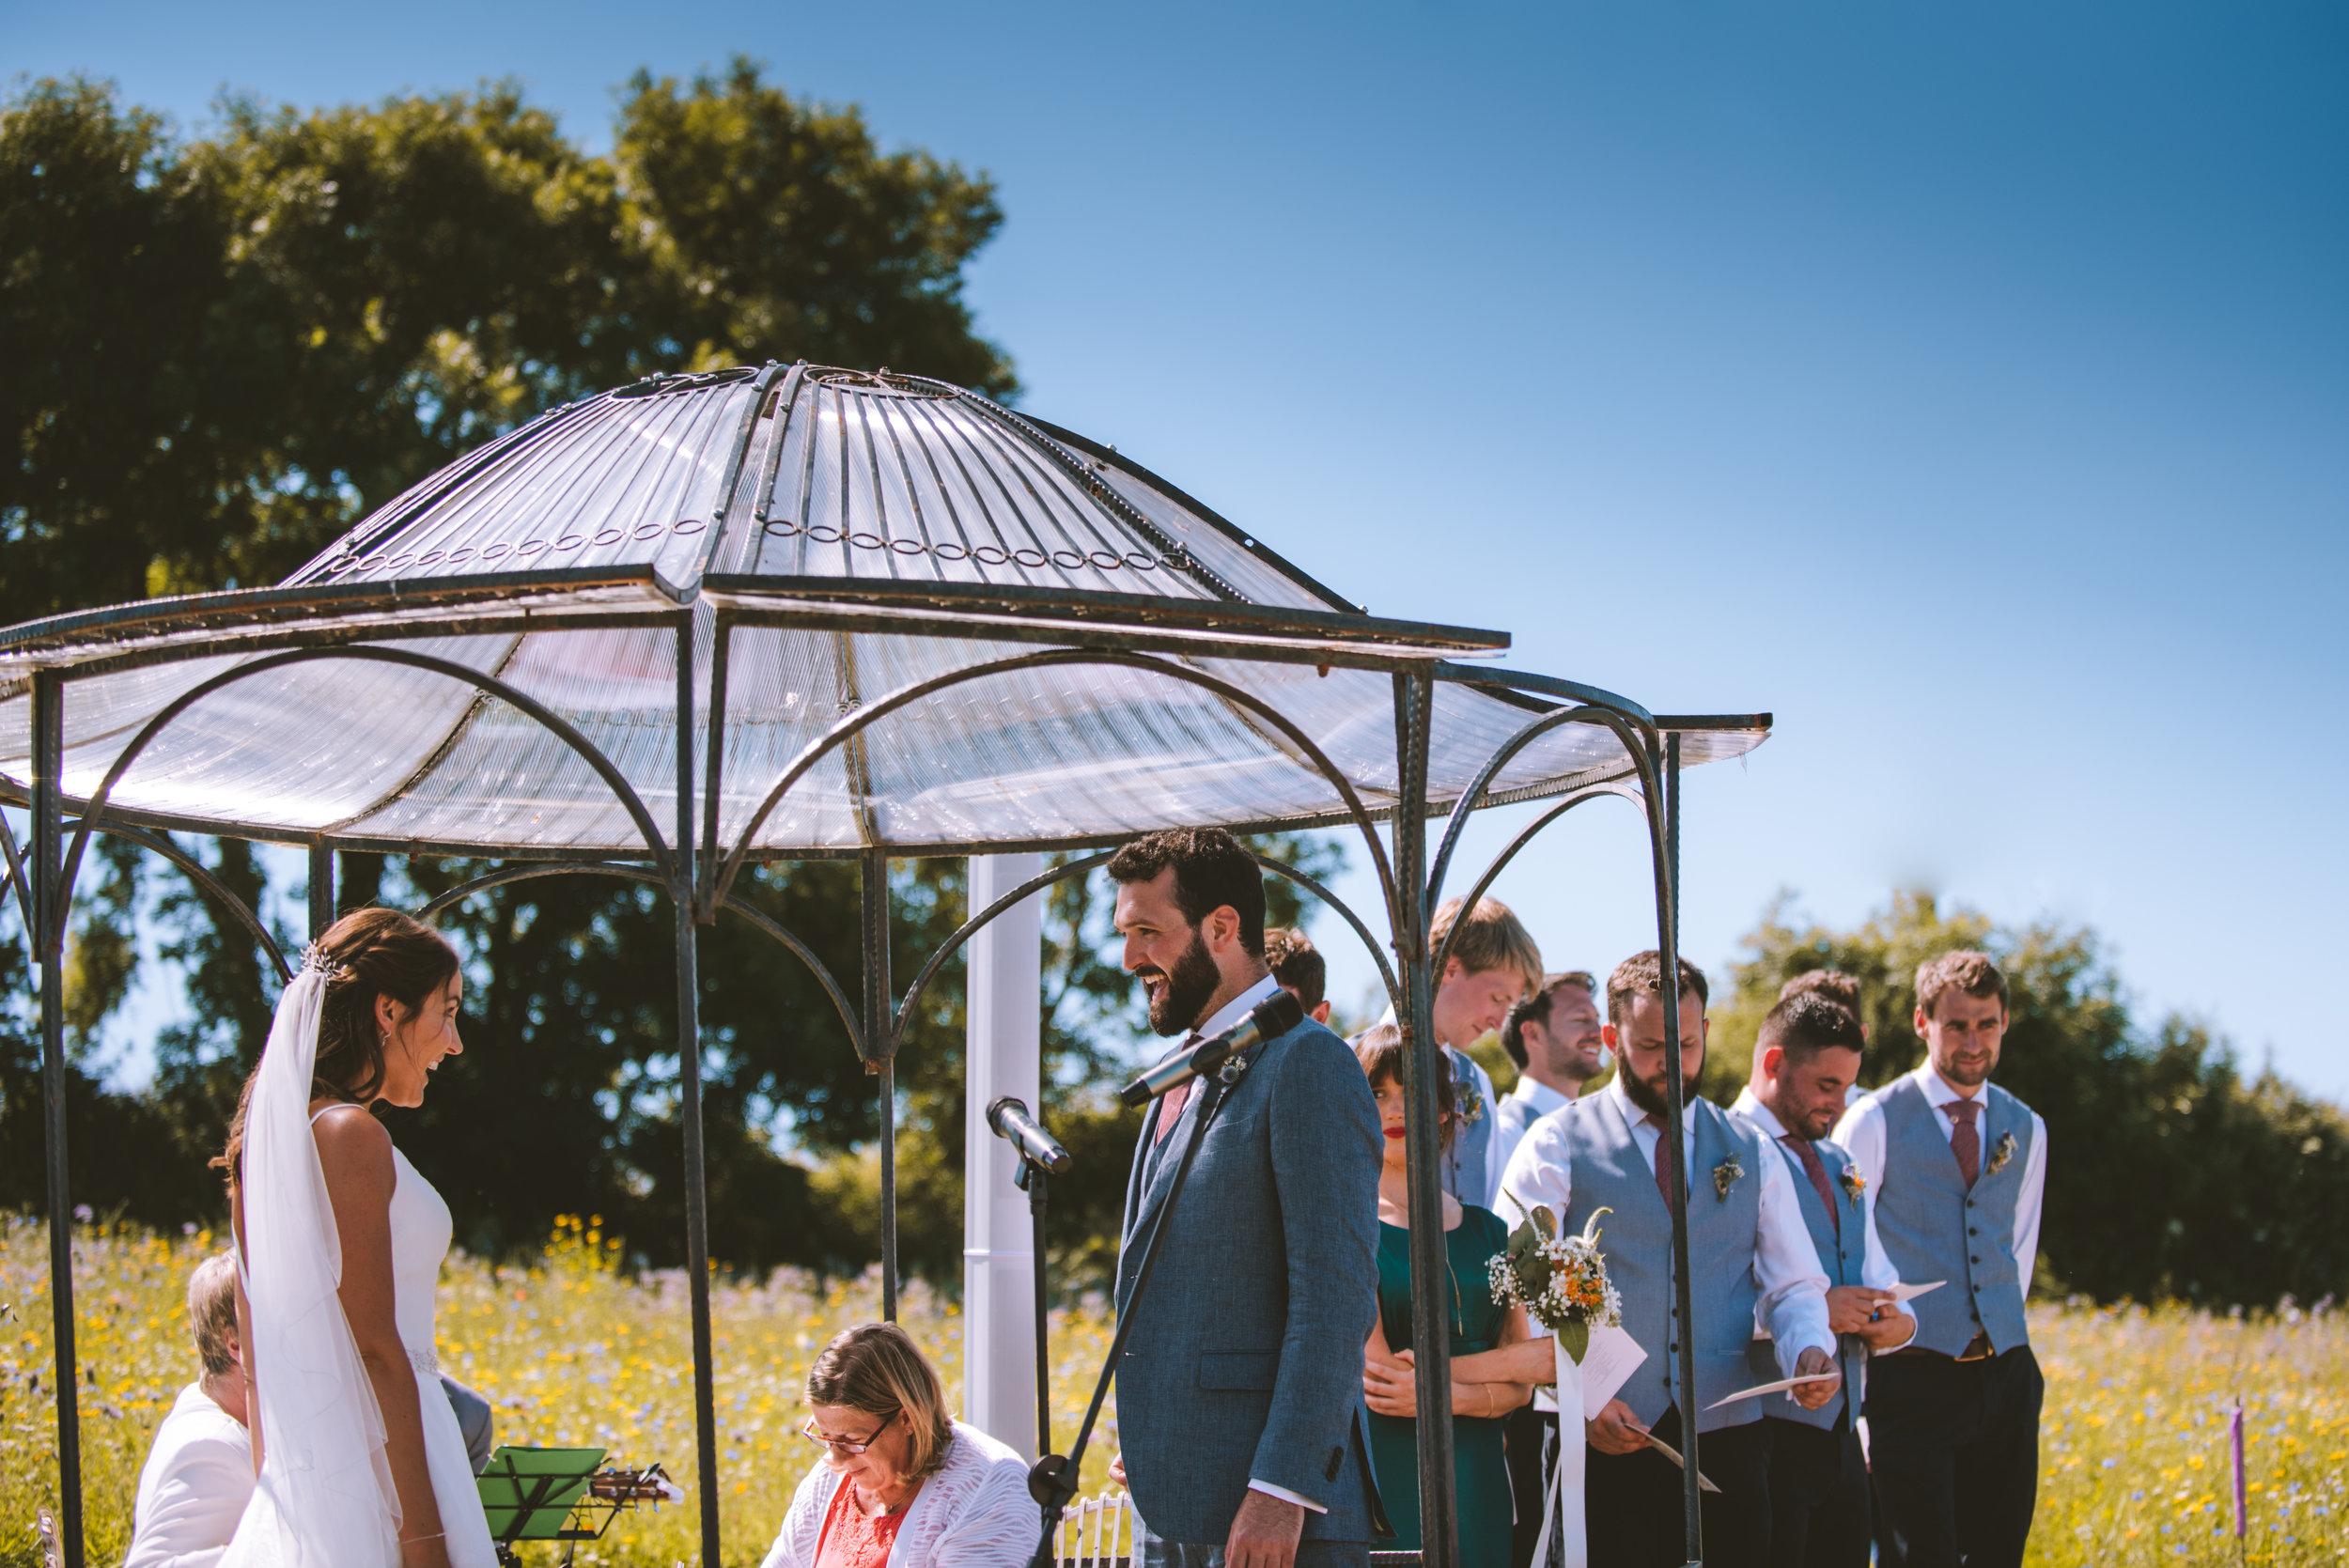 ash-barton-estate-wedding-photographer-mark-shaw-26.jpg